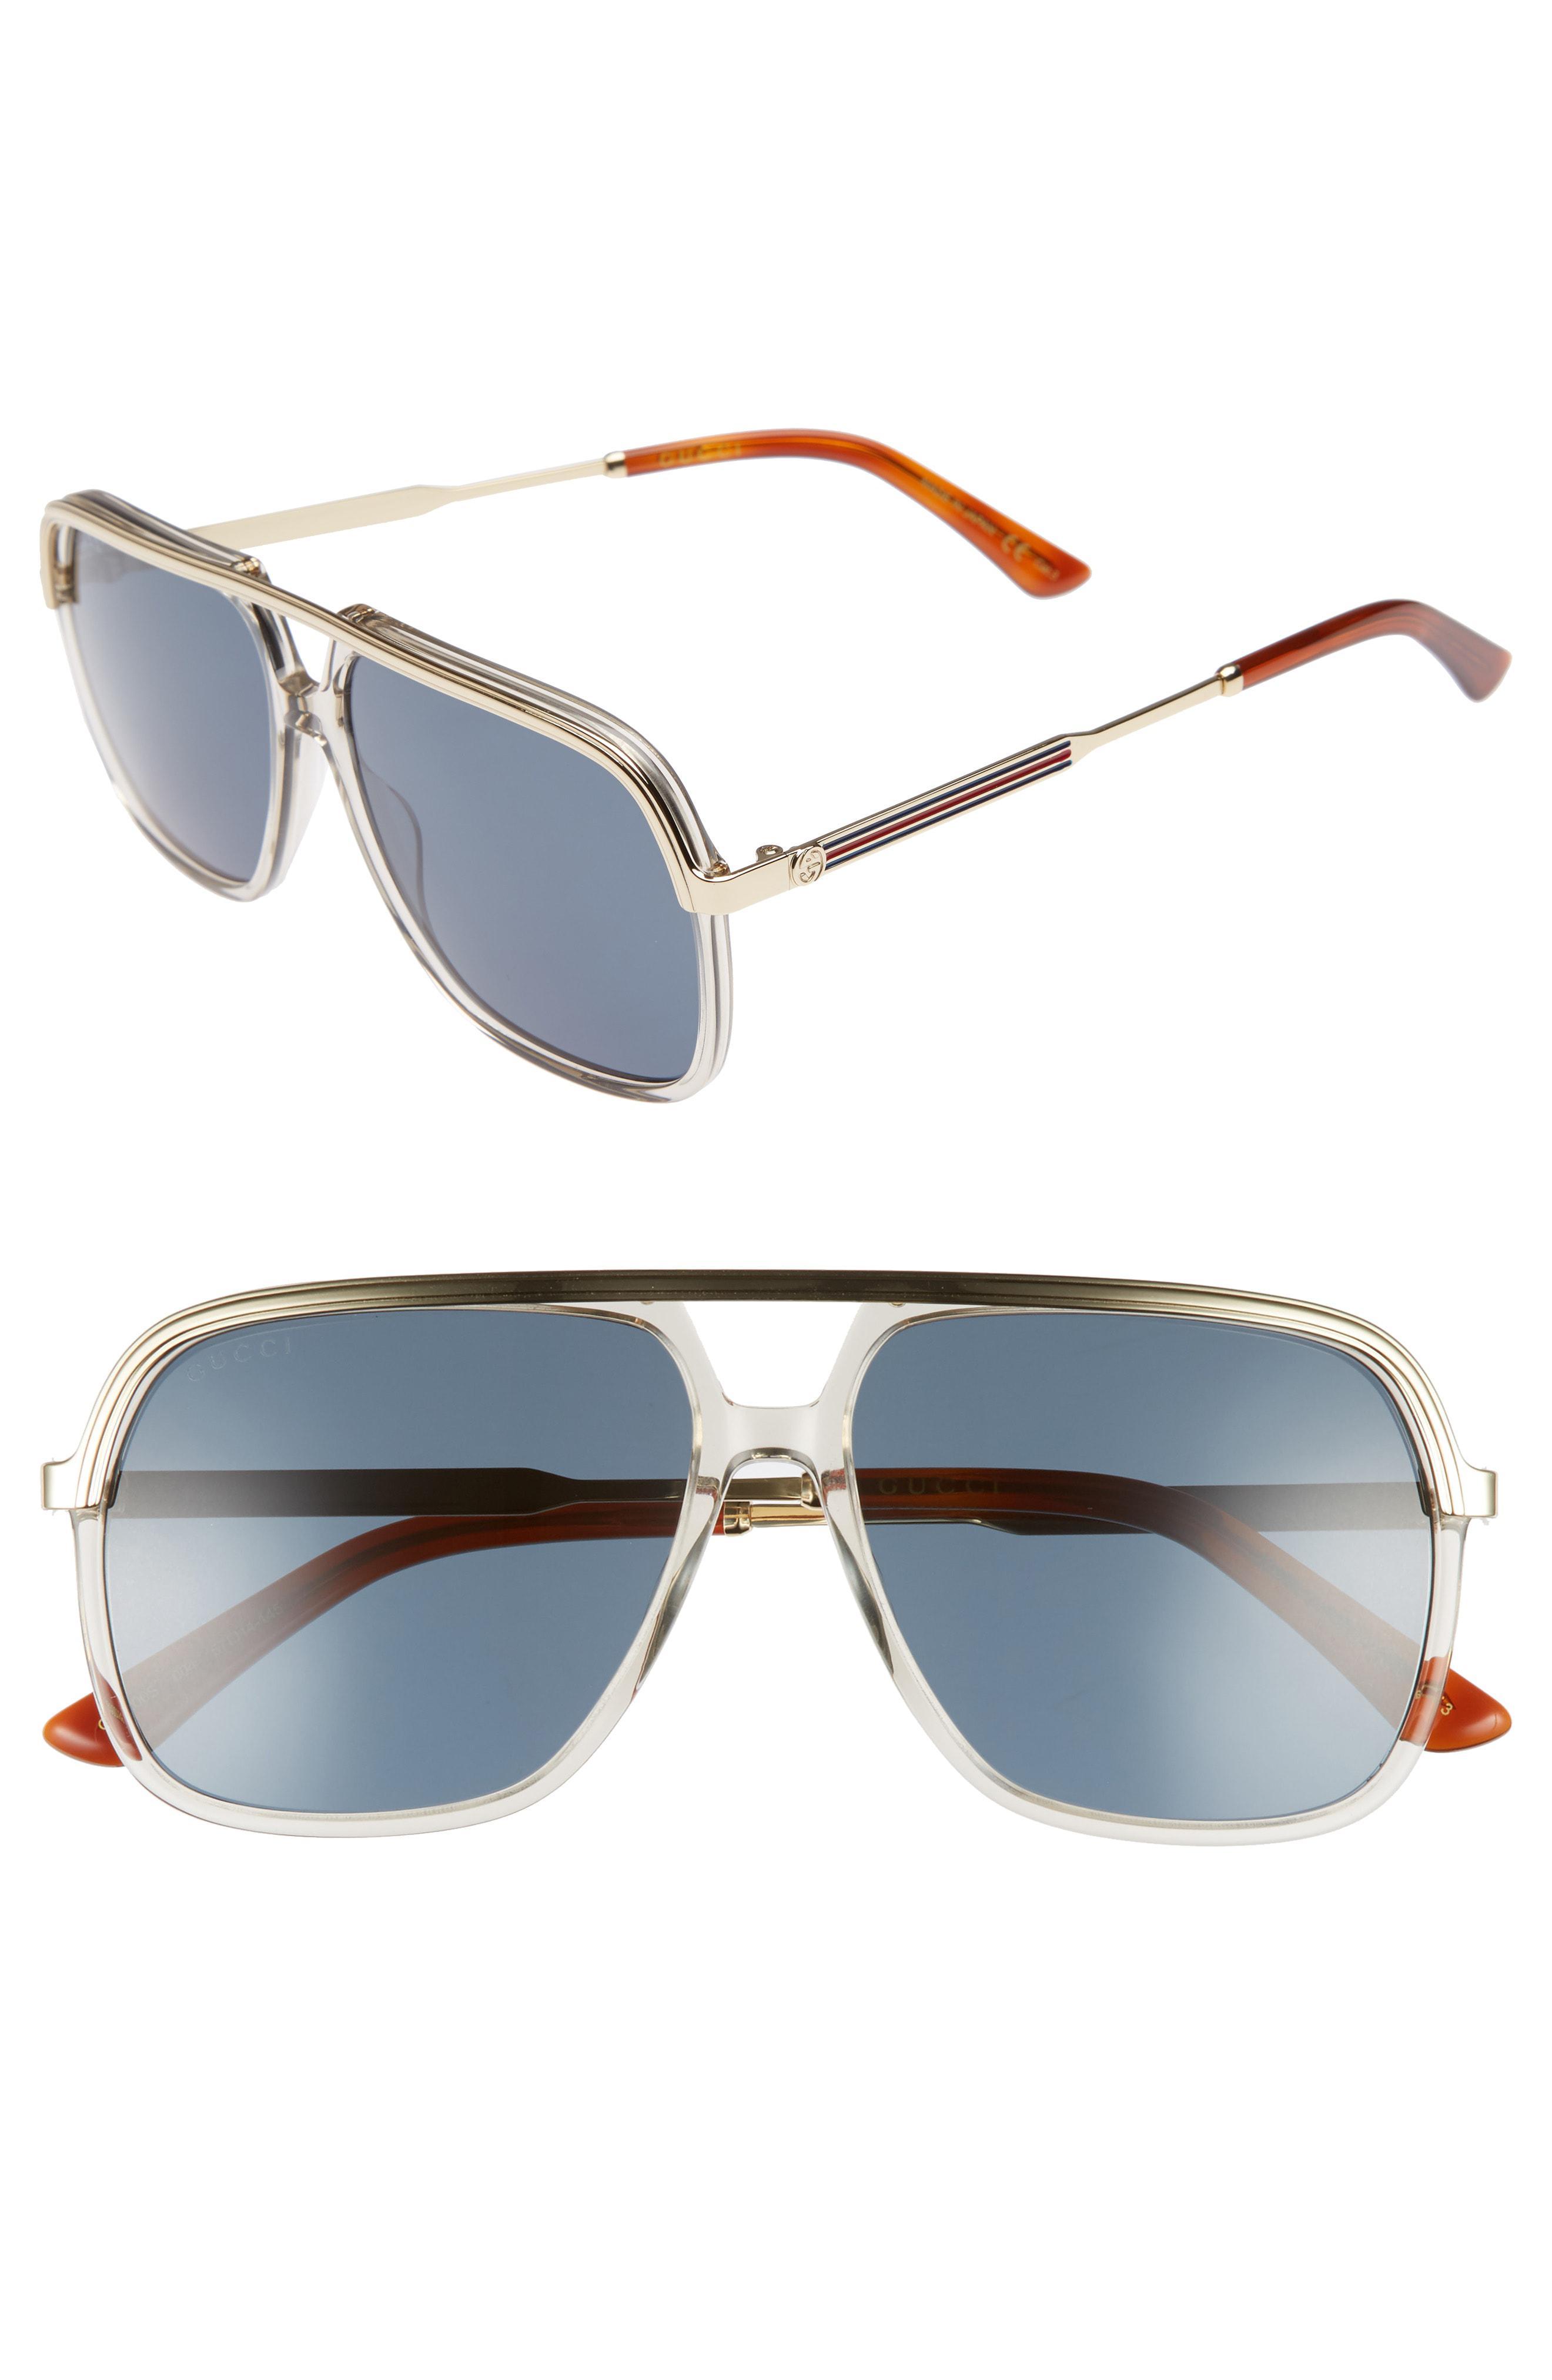 5d909c9d99 Lyst - Gucci 57mm Aviator Sunglasses - Mustard  Endura Gold in ...